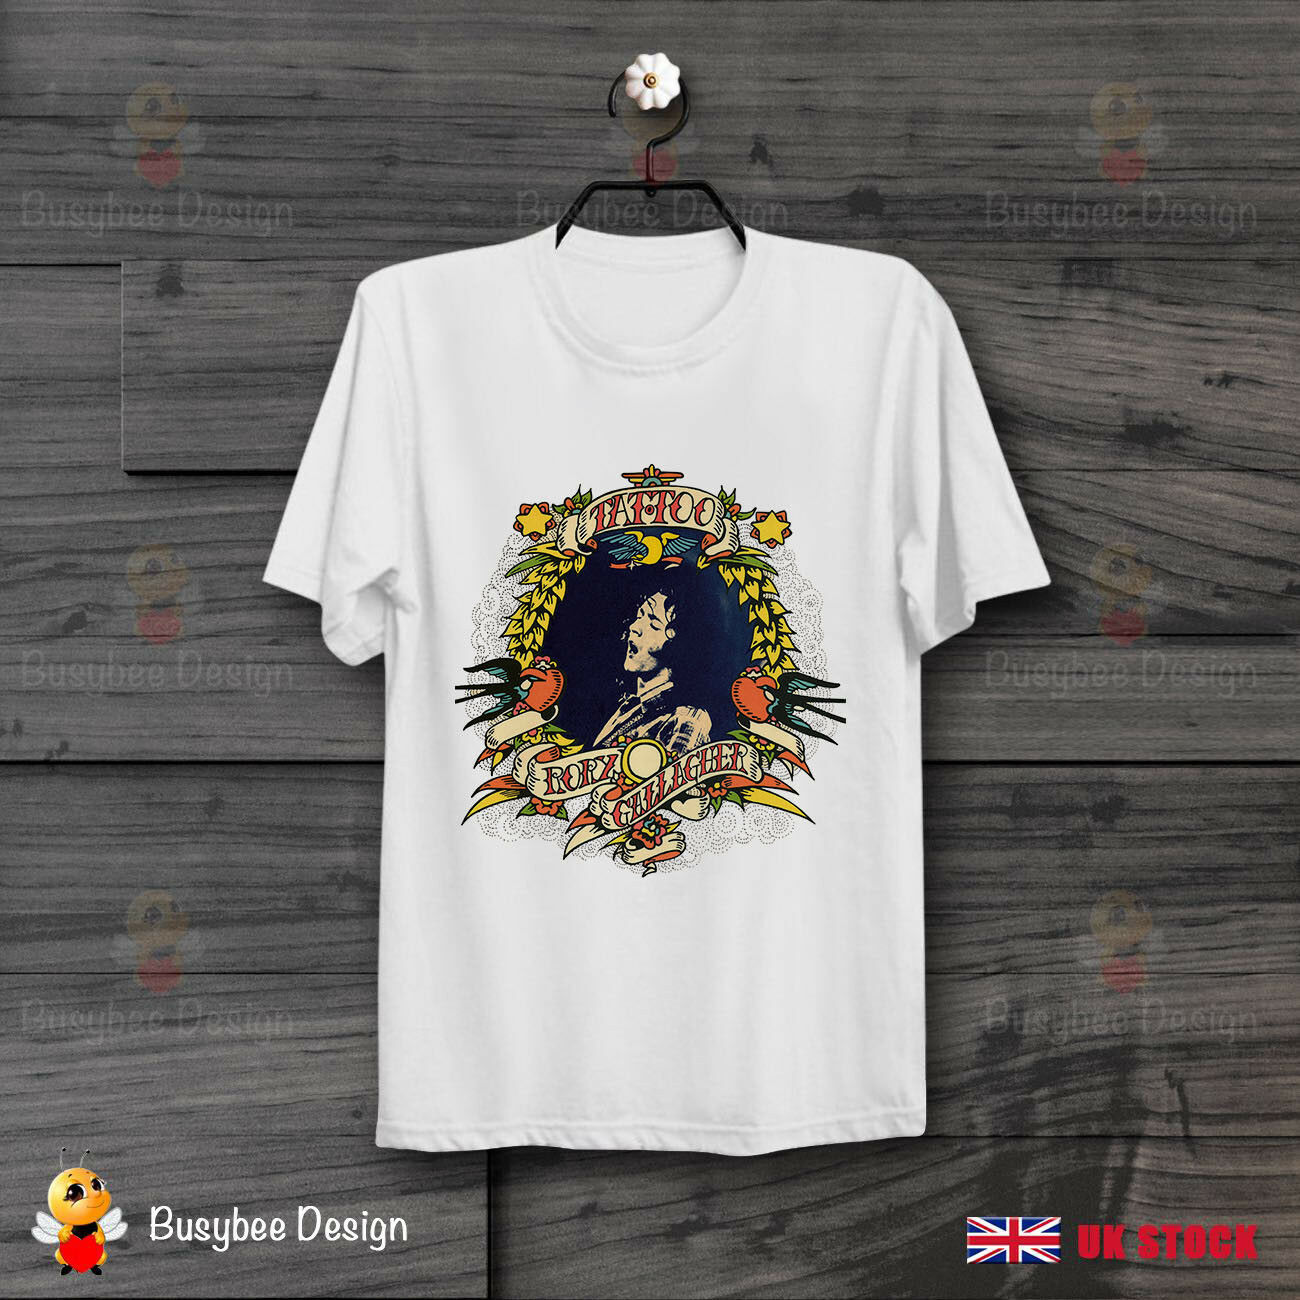 Rory gallagher tatuagem música blues rock retro legal vintage unisex t camisa b209